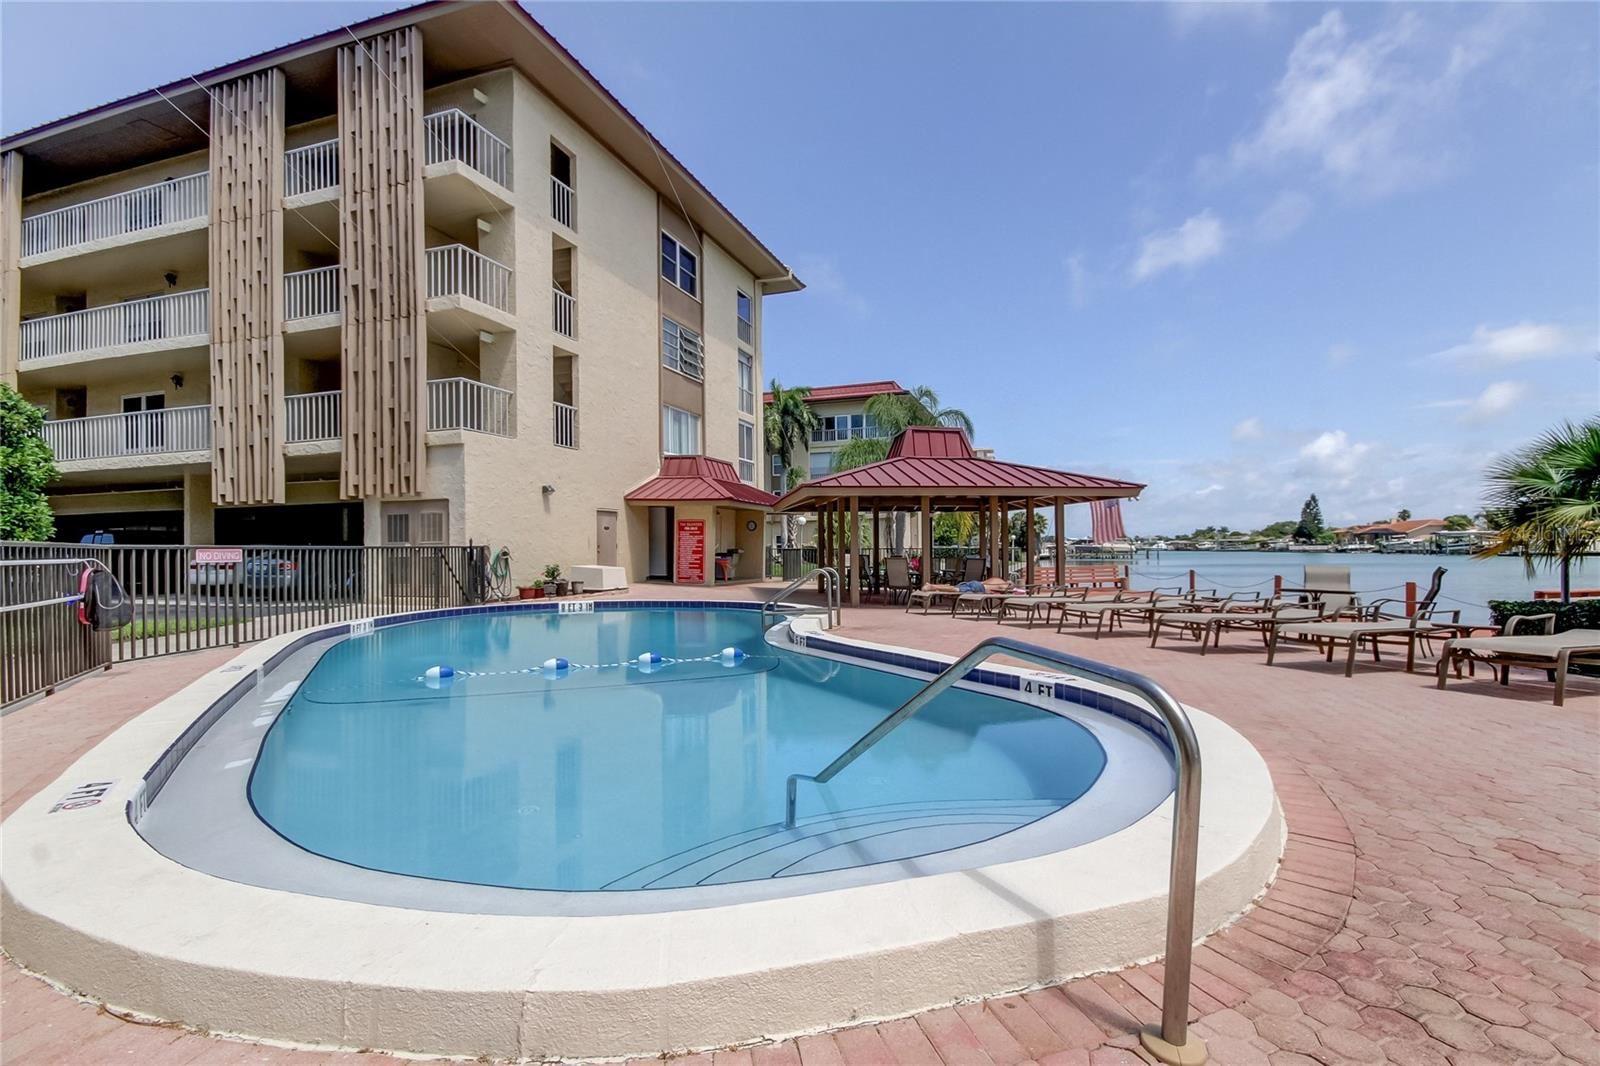 113 ISLAND WAY #221, Clearwater Beach, FL 33767 - MLS#: U8122729